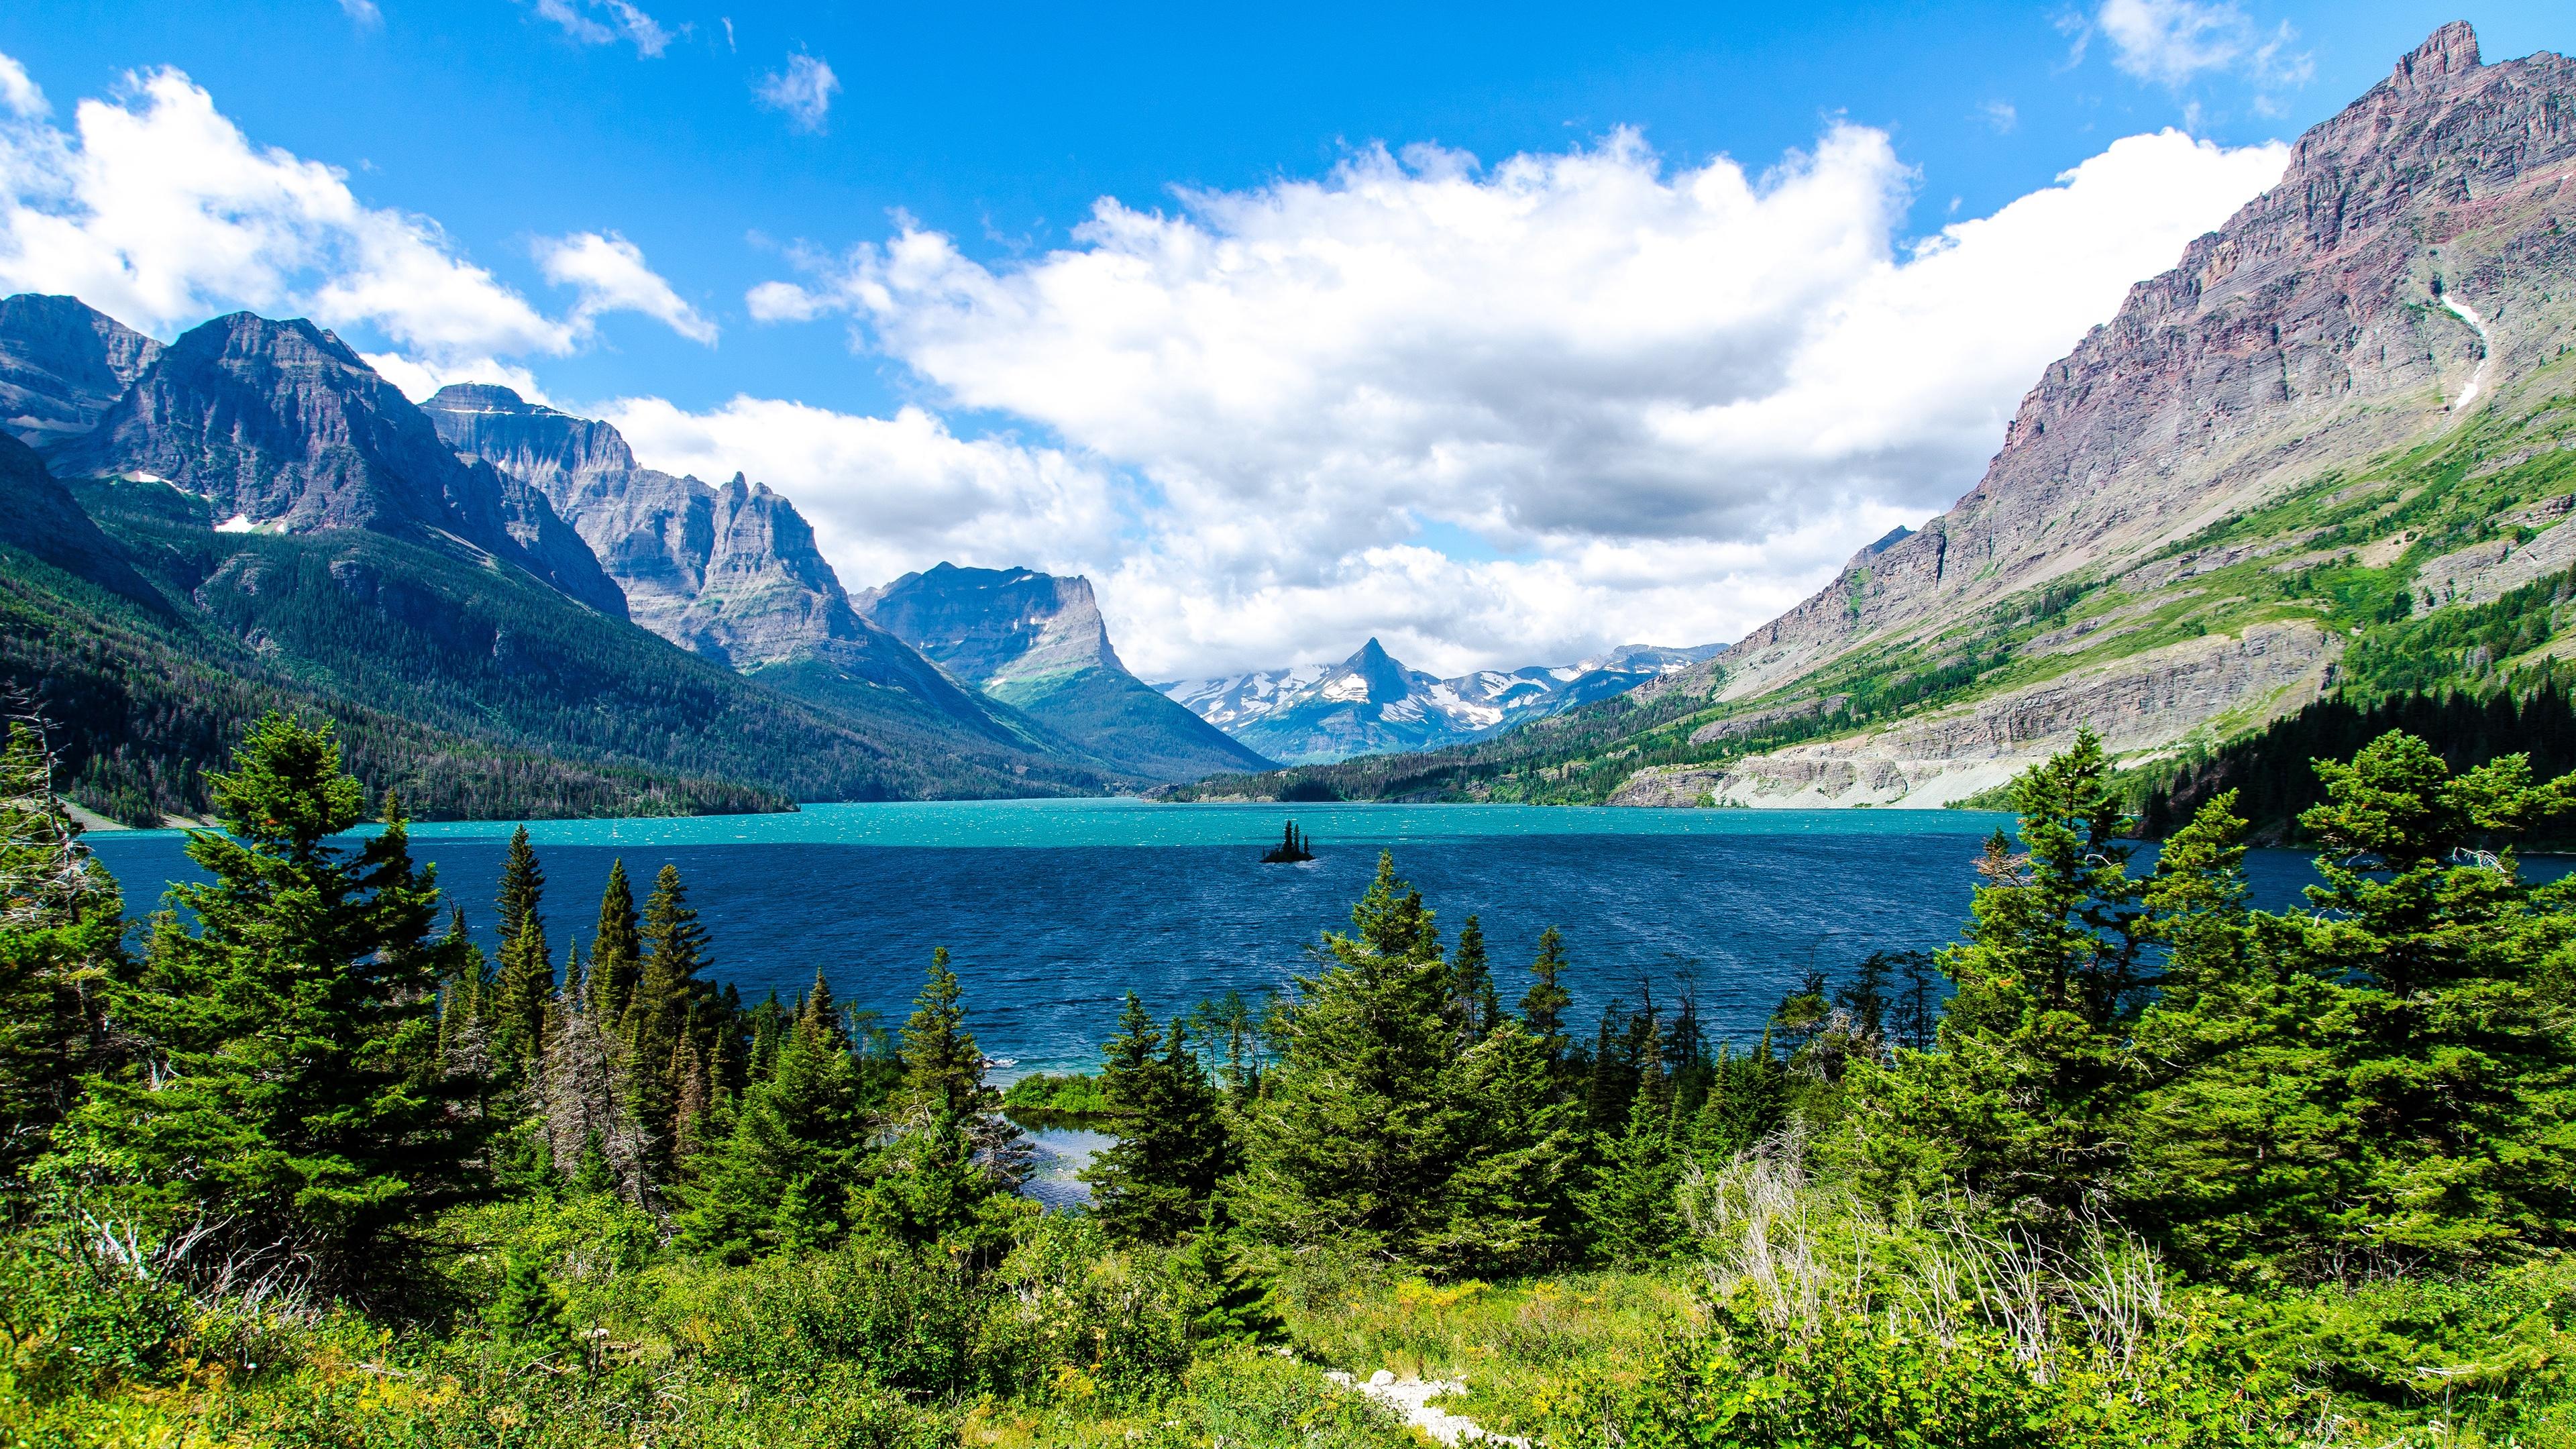 Saint Mary Lake Glacier National Park Wallpapers HD Wallpapers 3840x2160